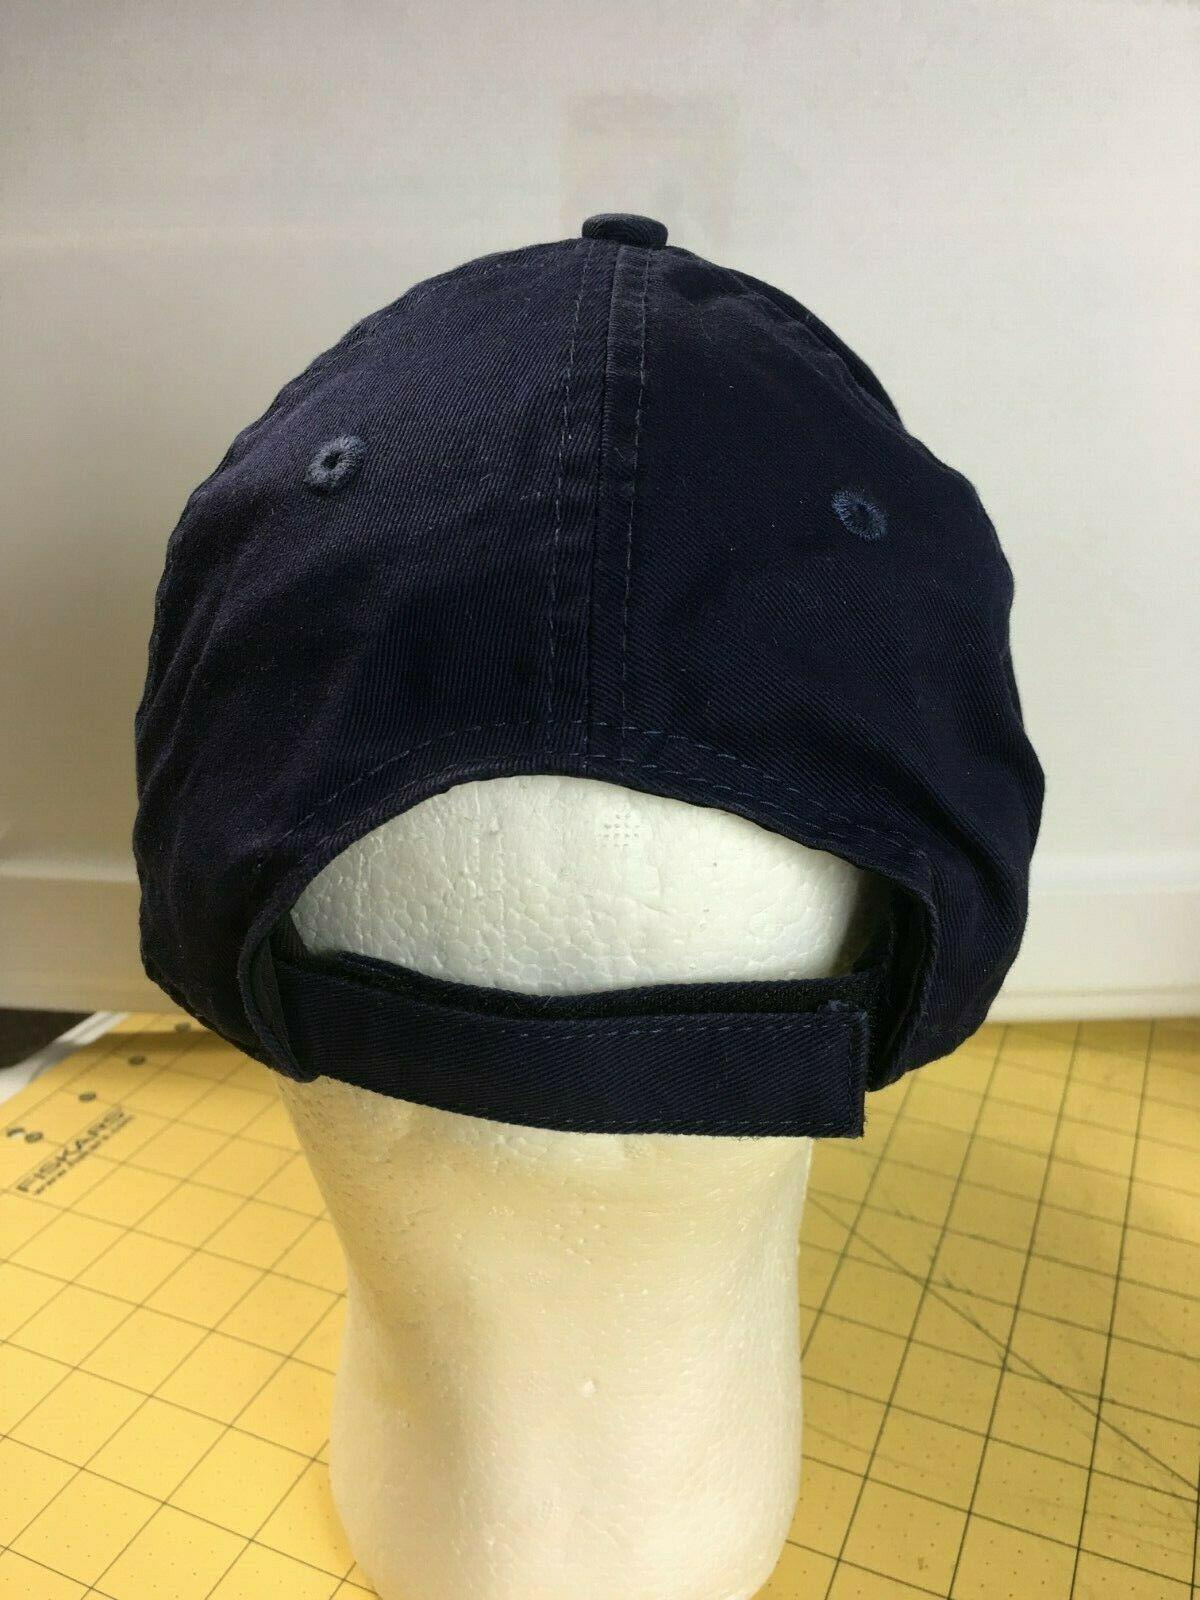 Caps Hats Snap-backs 2016 Baseball All-Star Game Souvenir Cap Hat